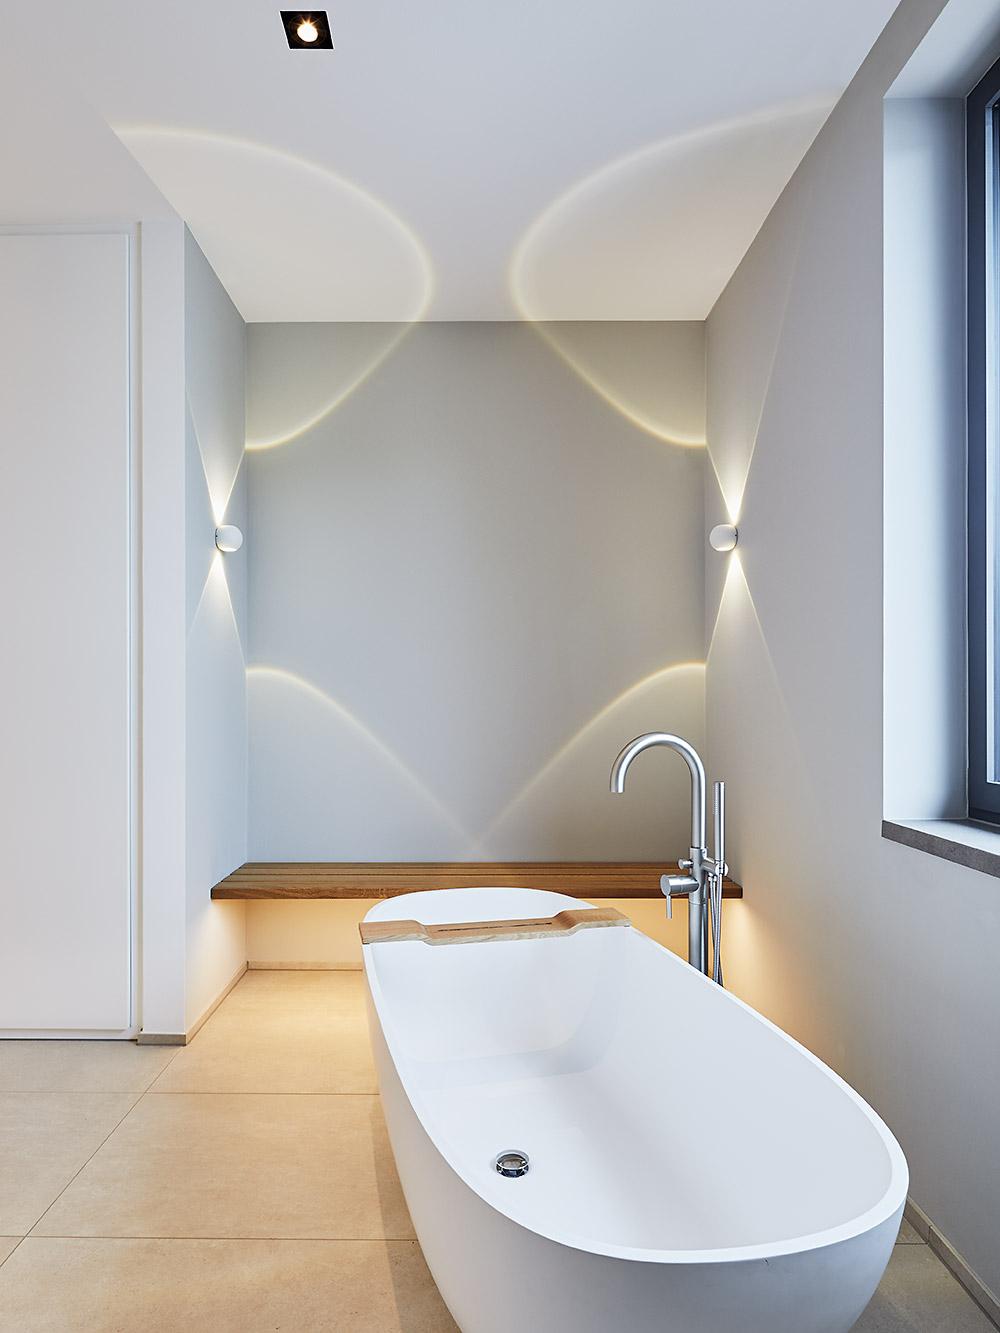 Architekturfotografie Villa S, Klaus Mäs Architektur @ Philip Kistner